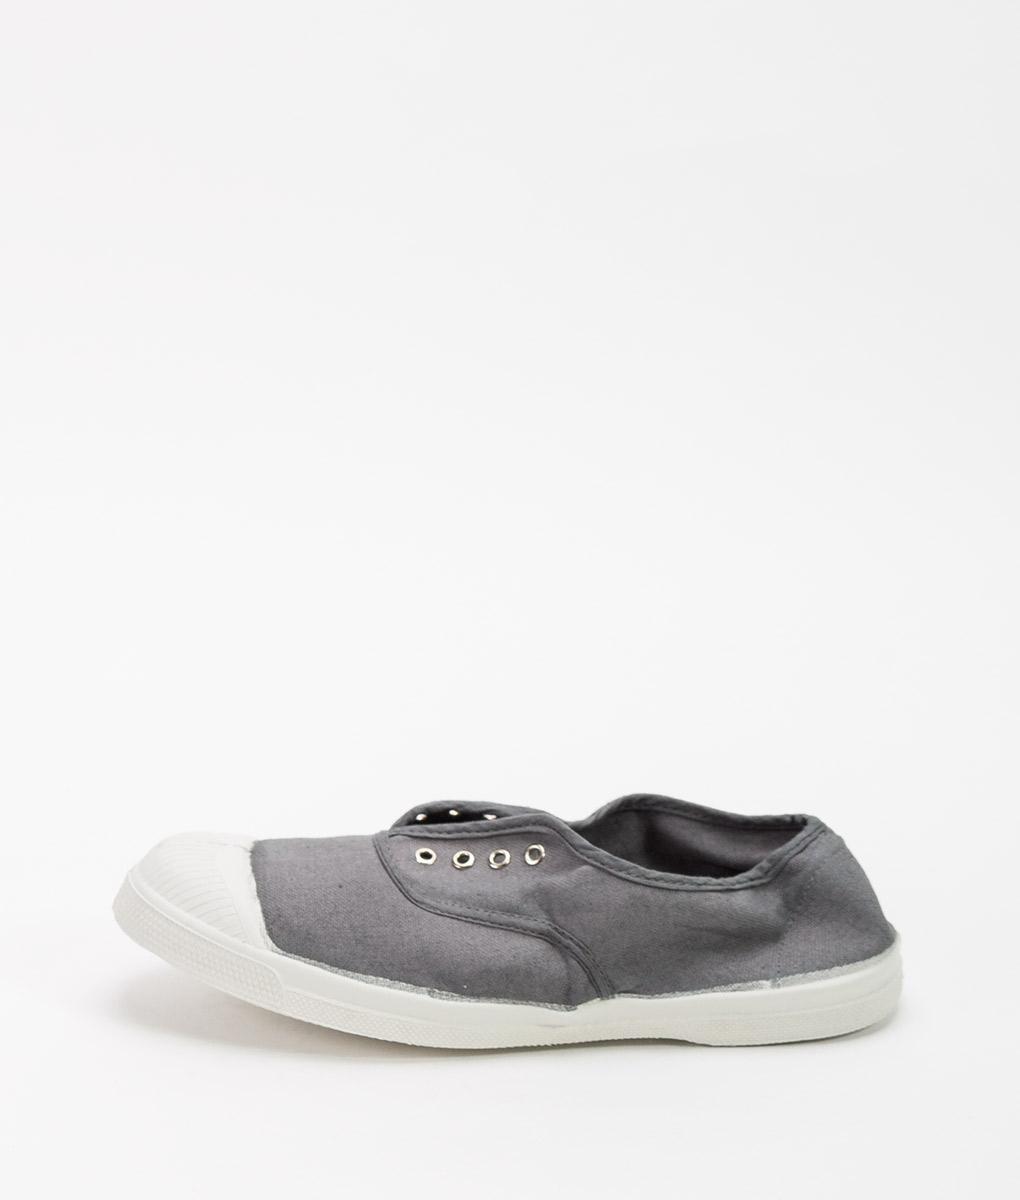 BENSIMON Women Sneakers 15149 ELLY, Medium Grey 39.99 1